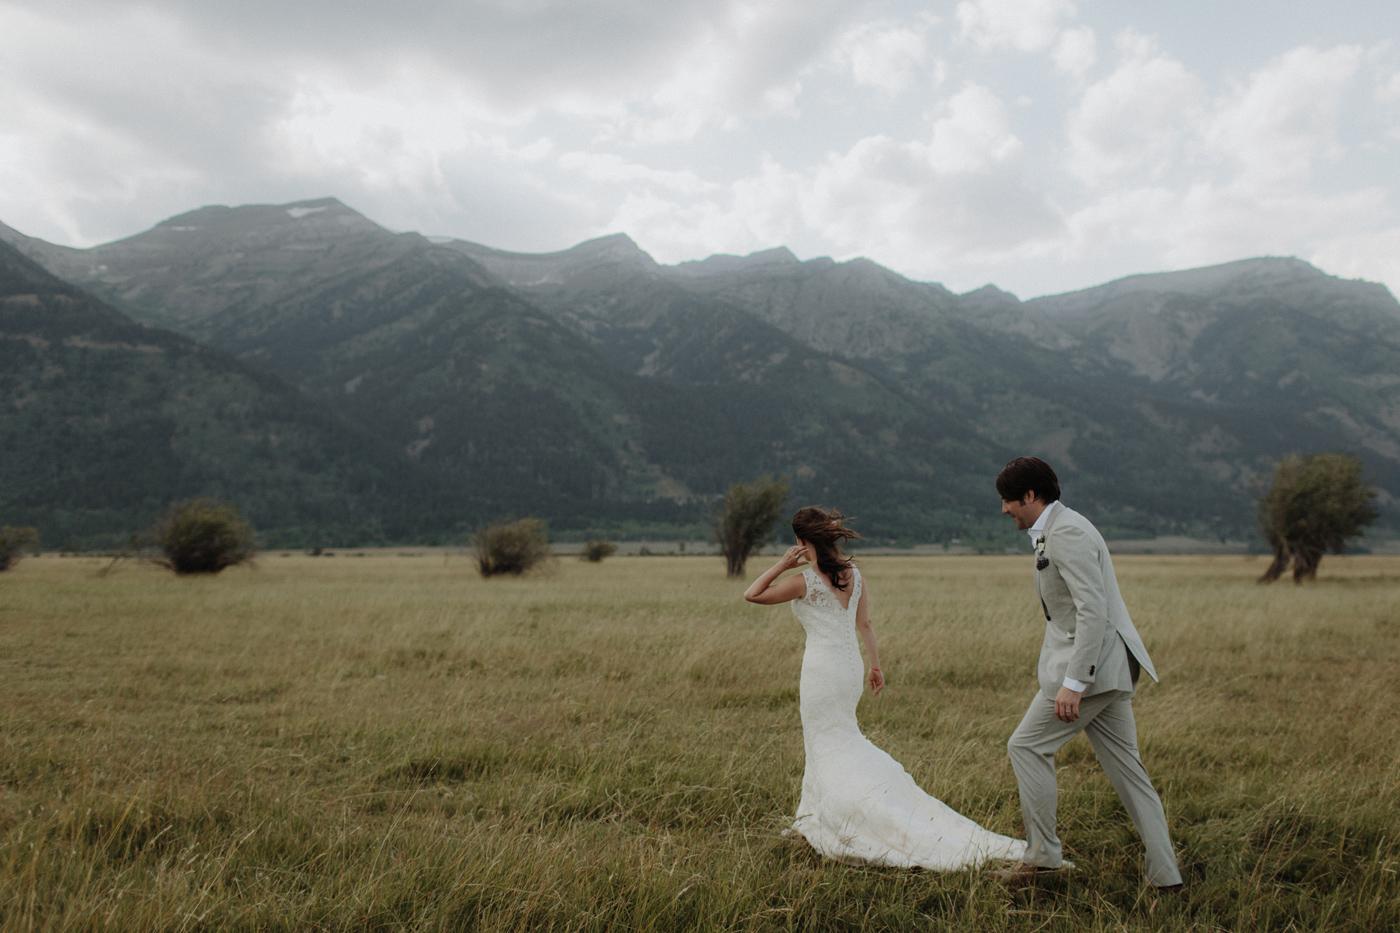 048-grand-teton-jackson-hole-wyoming-wedding.jpg